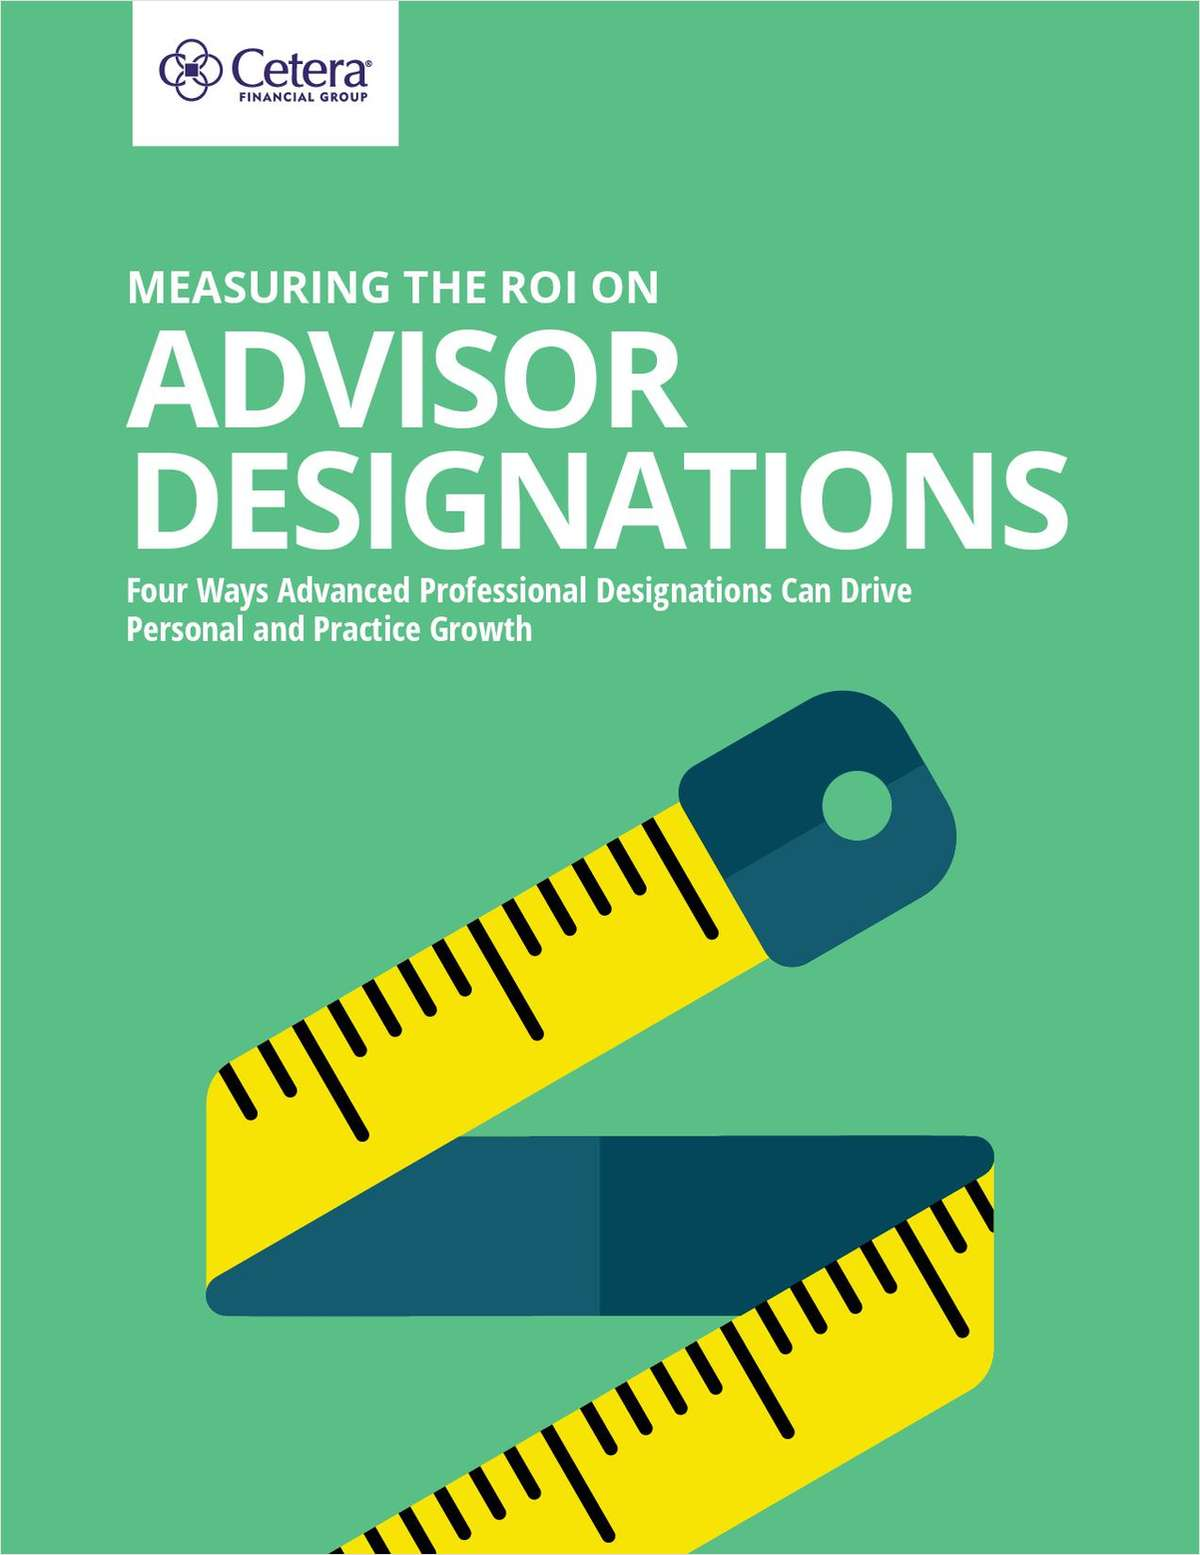 Measuring the ROI on Advisor Designations